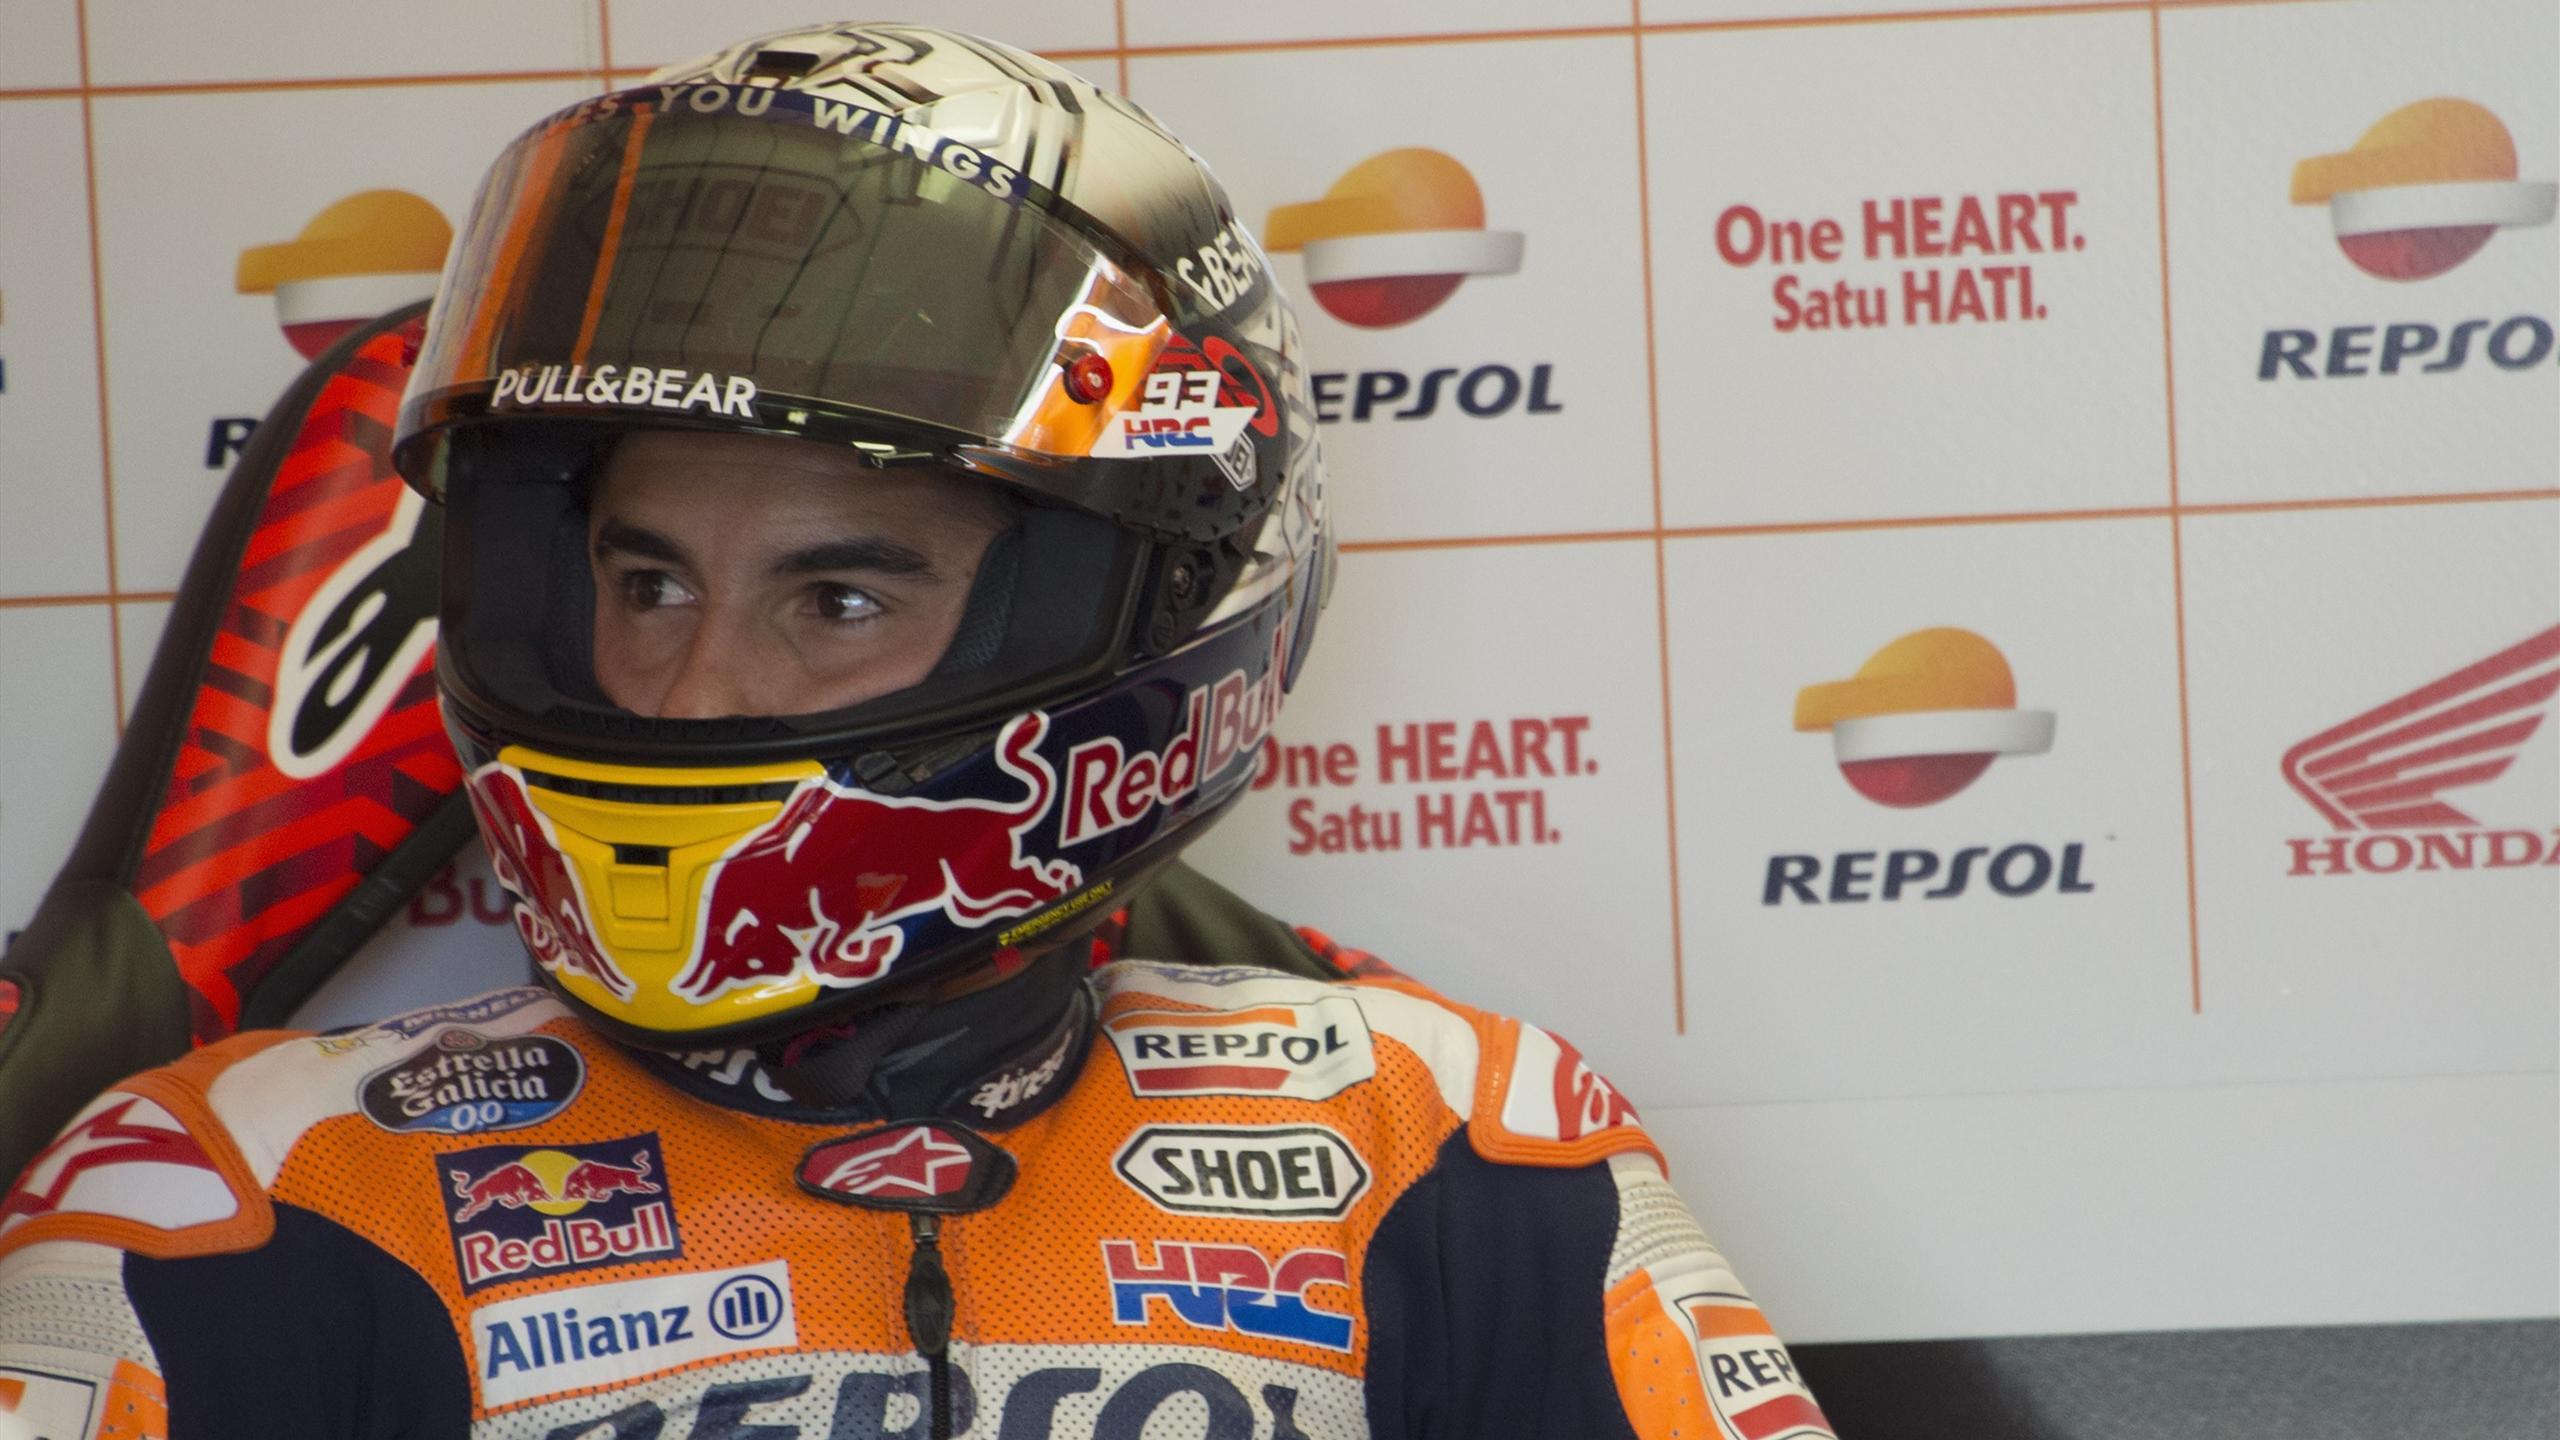 Marc Marquez storms to pole, Andrea Dovizioso down in 11th - cetusnews